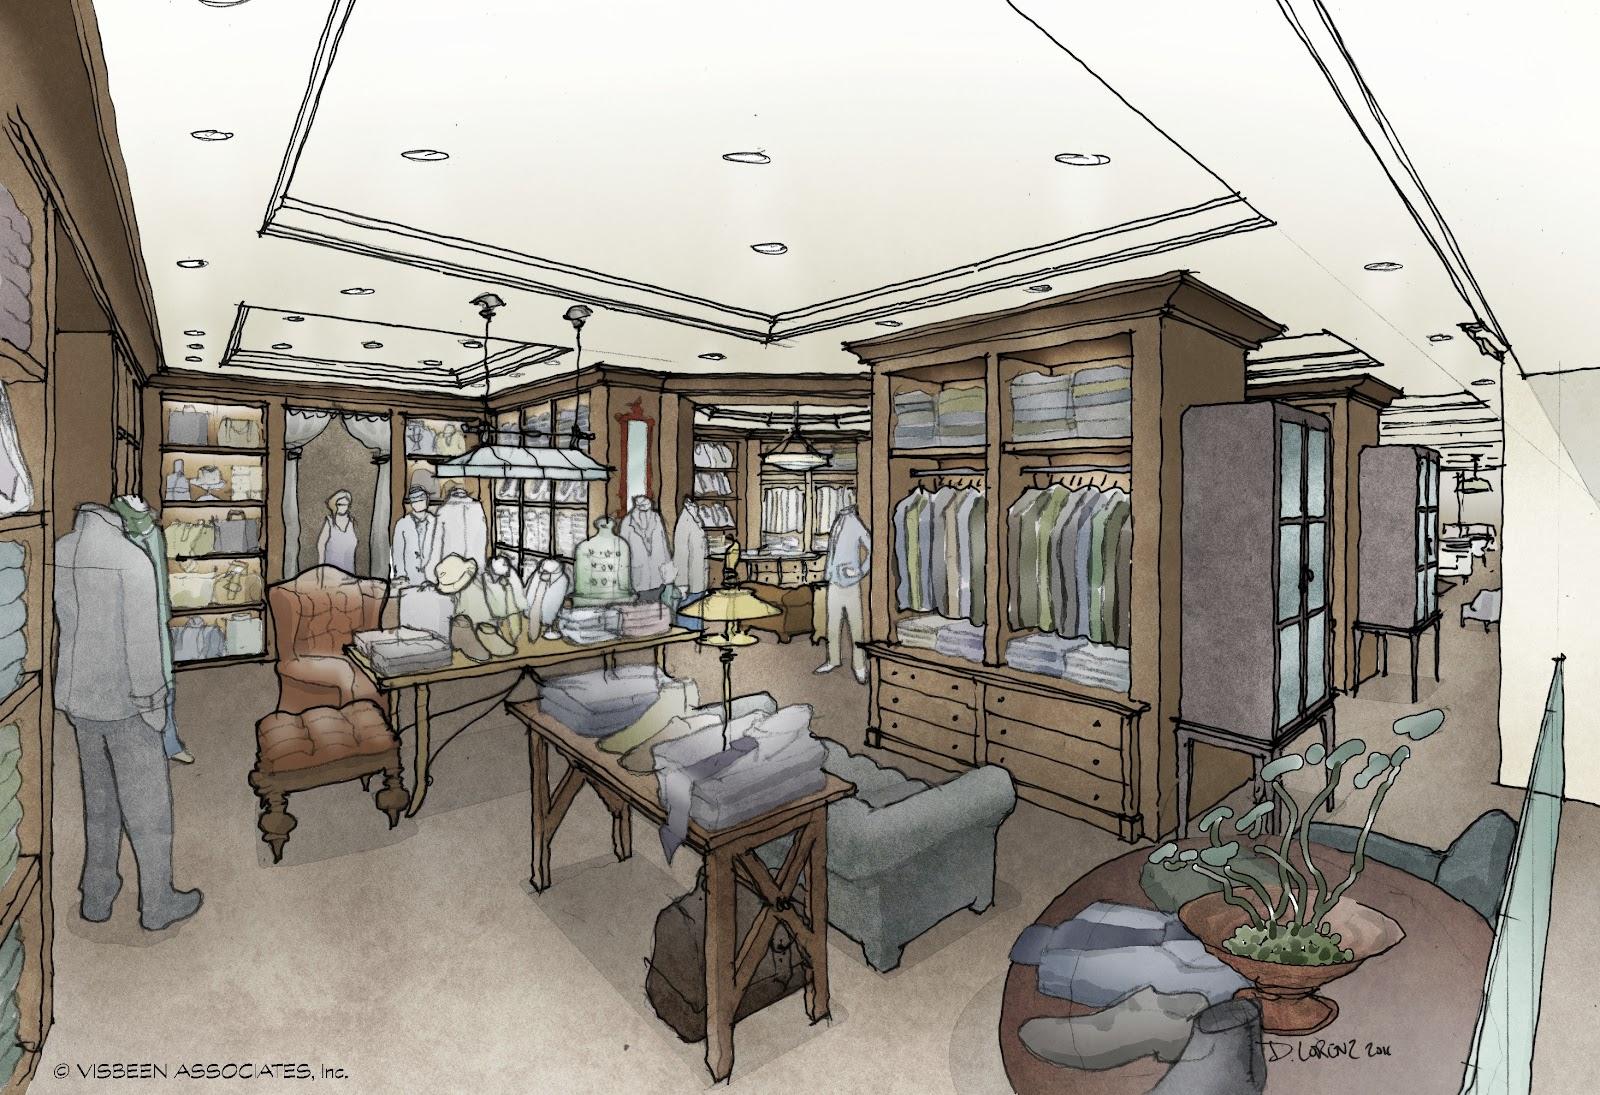 Big News For Grand Rapids Visbeen Architects - Featured designer visbeen associates